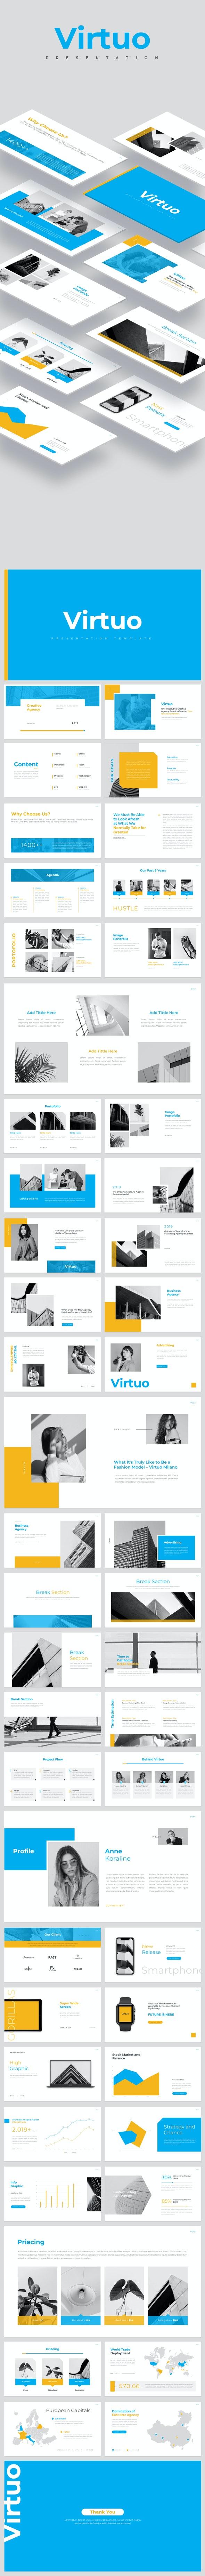 Virtuo Google Slides - Google Slides Presentation Templates